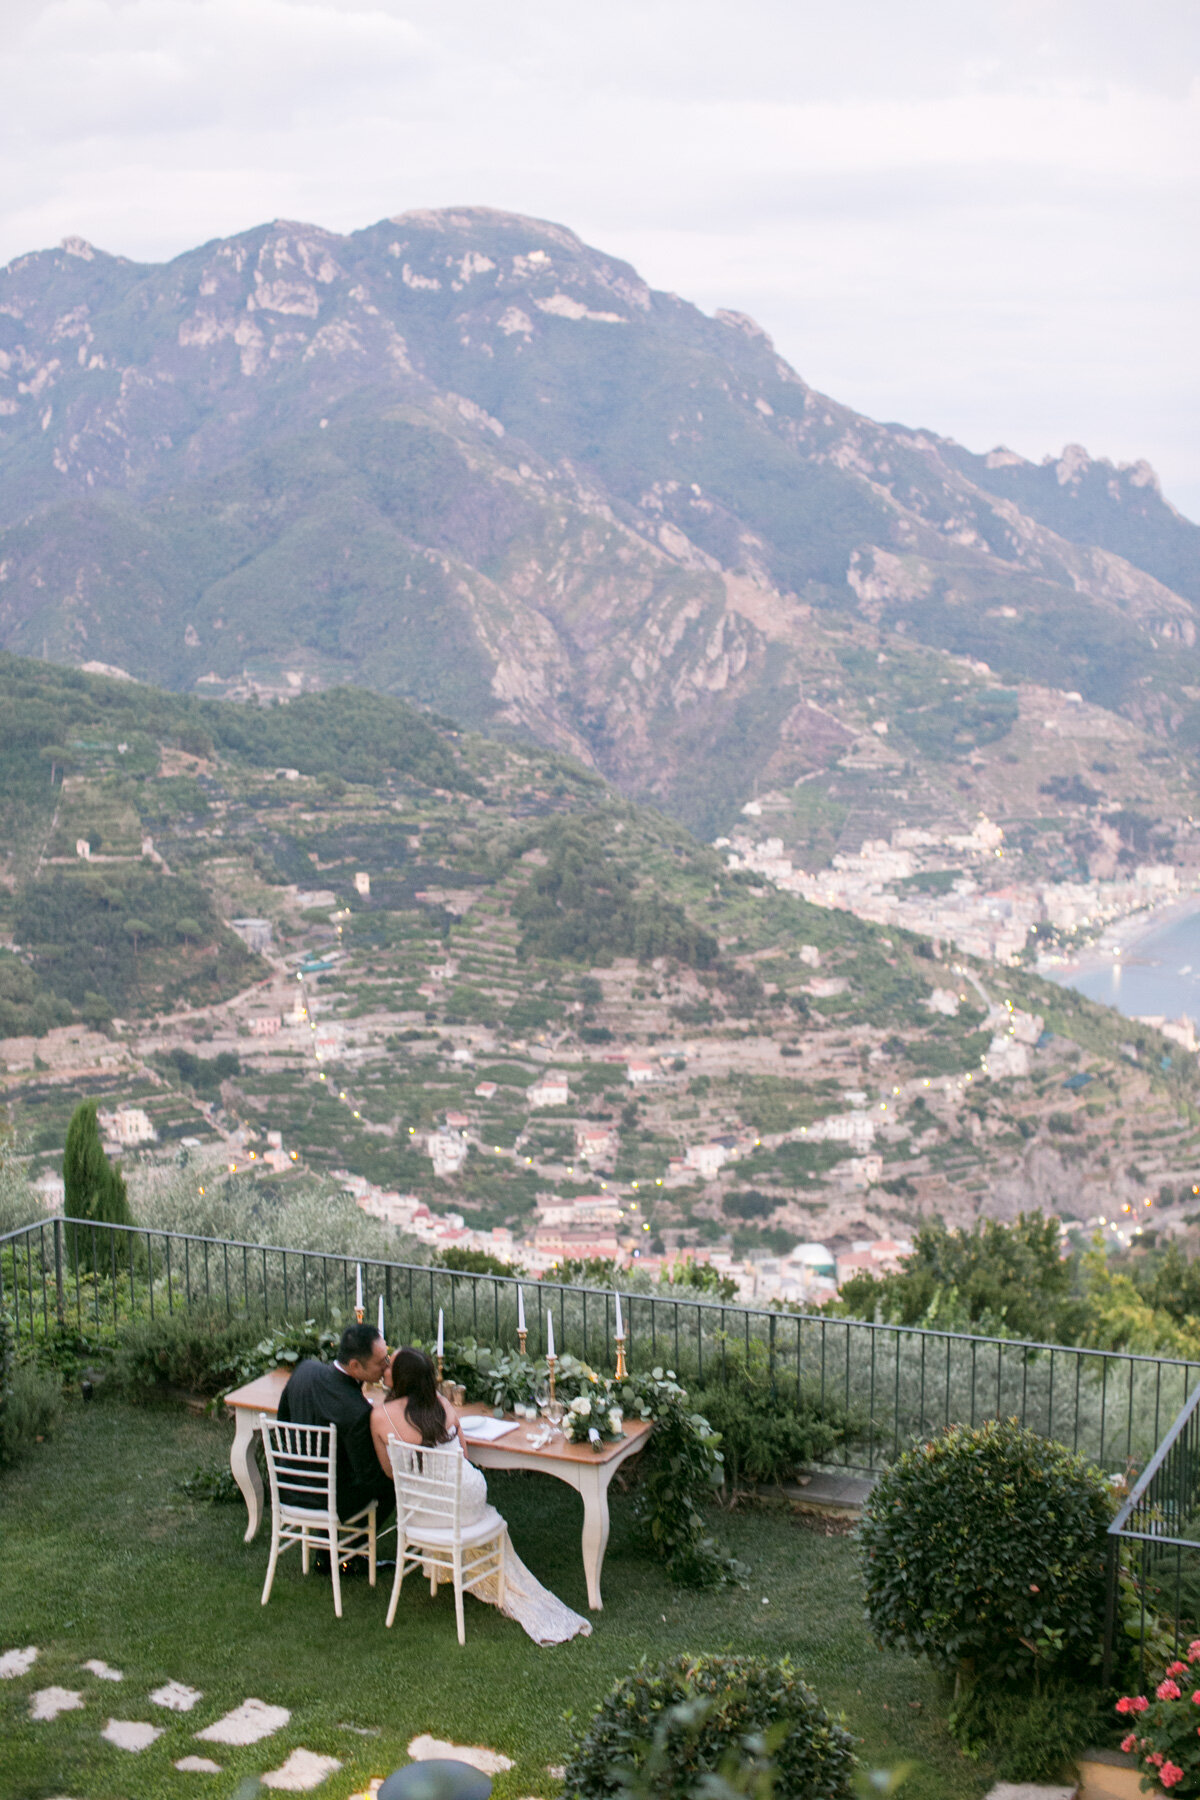 Belmond-Hotel-Caruso-ravello-elopement-Katie-Grant-destination-wedding (47 of 50).jpg